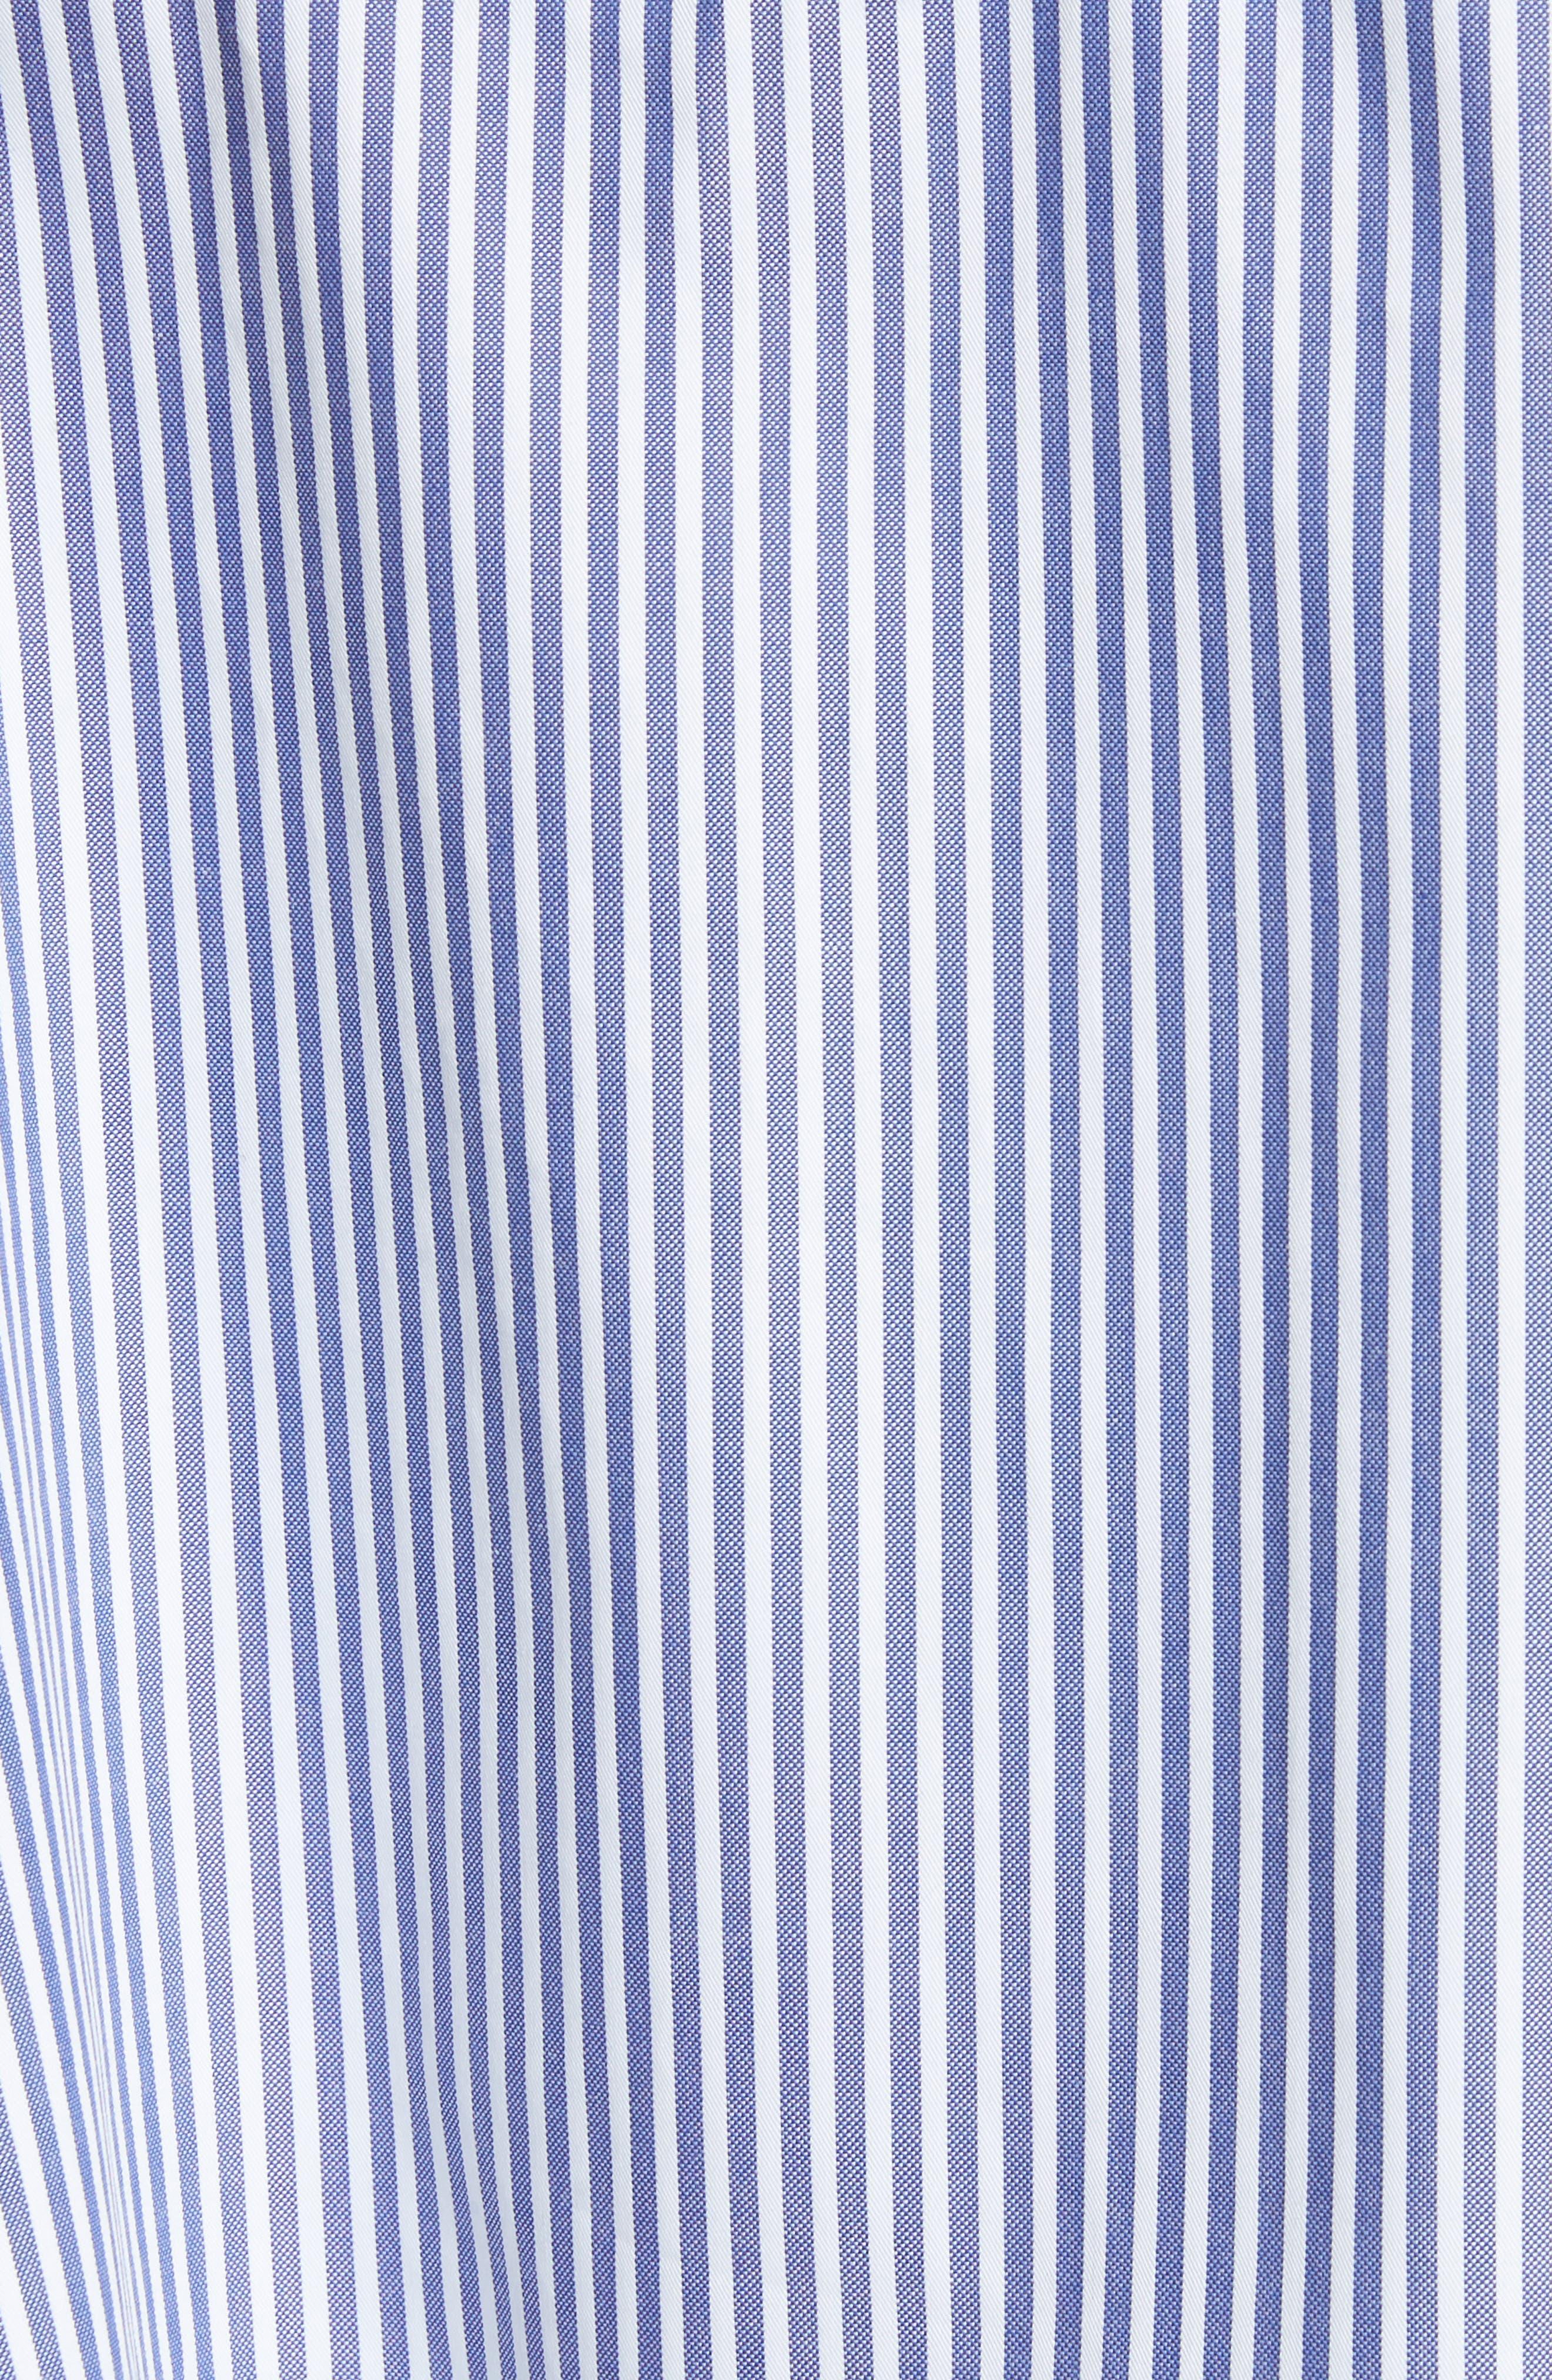 Stripe Cotton Swing Tank,                             Alternate thumbnail 5, color,                             450